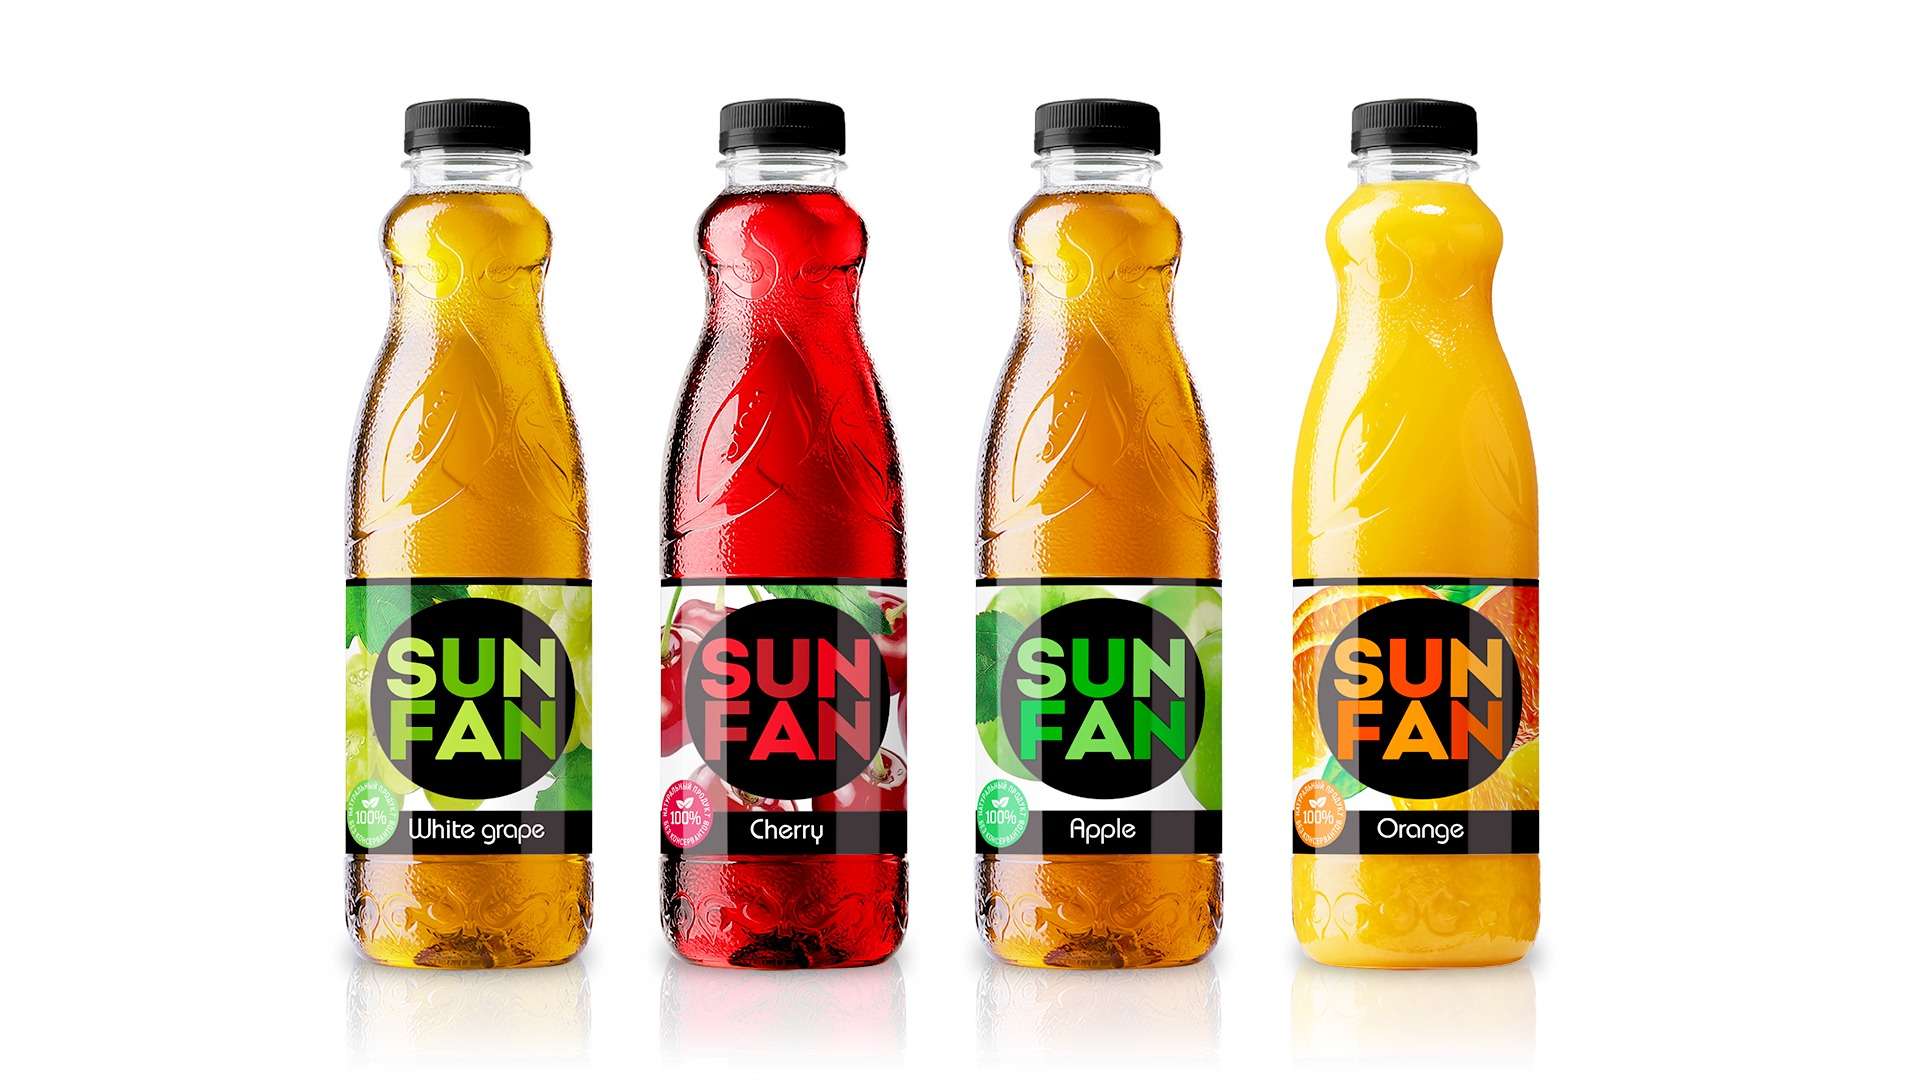 Asgard Branding, SUN FUN, дизайн упаковки, package design, fast moving consumer goods